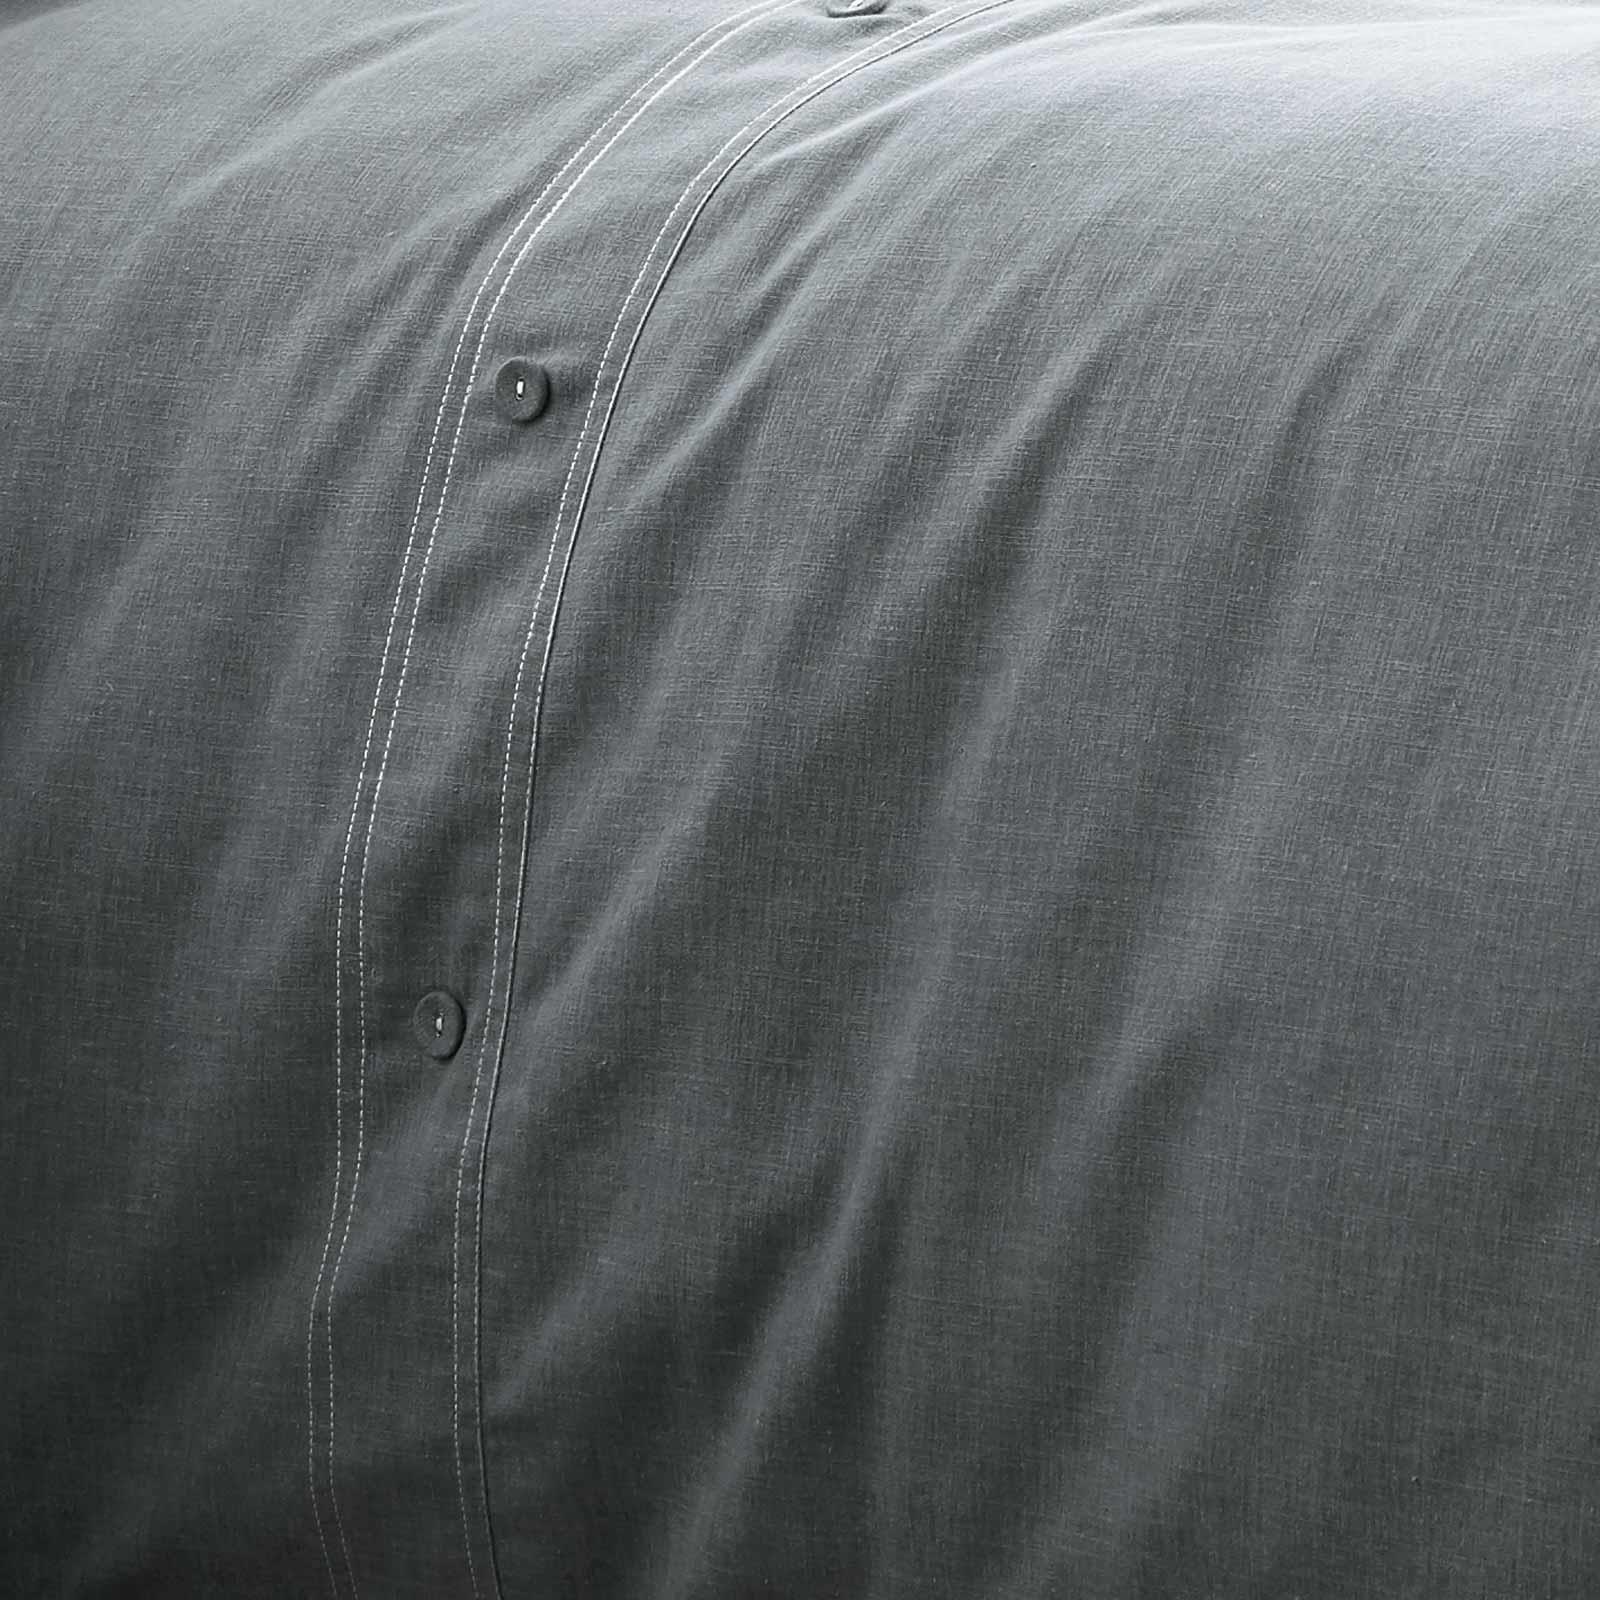 Azul-fundas-nordicas-Denim-Chambray-Boton-Detalle-de-lujo-cubierta-del-edredon-conjuntos-de-cama miniatura 13